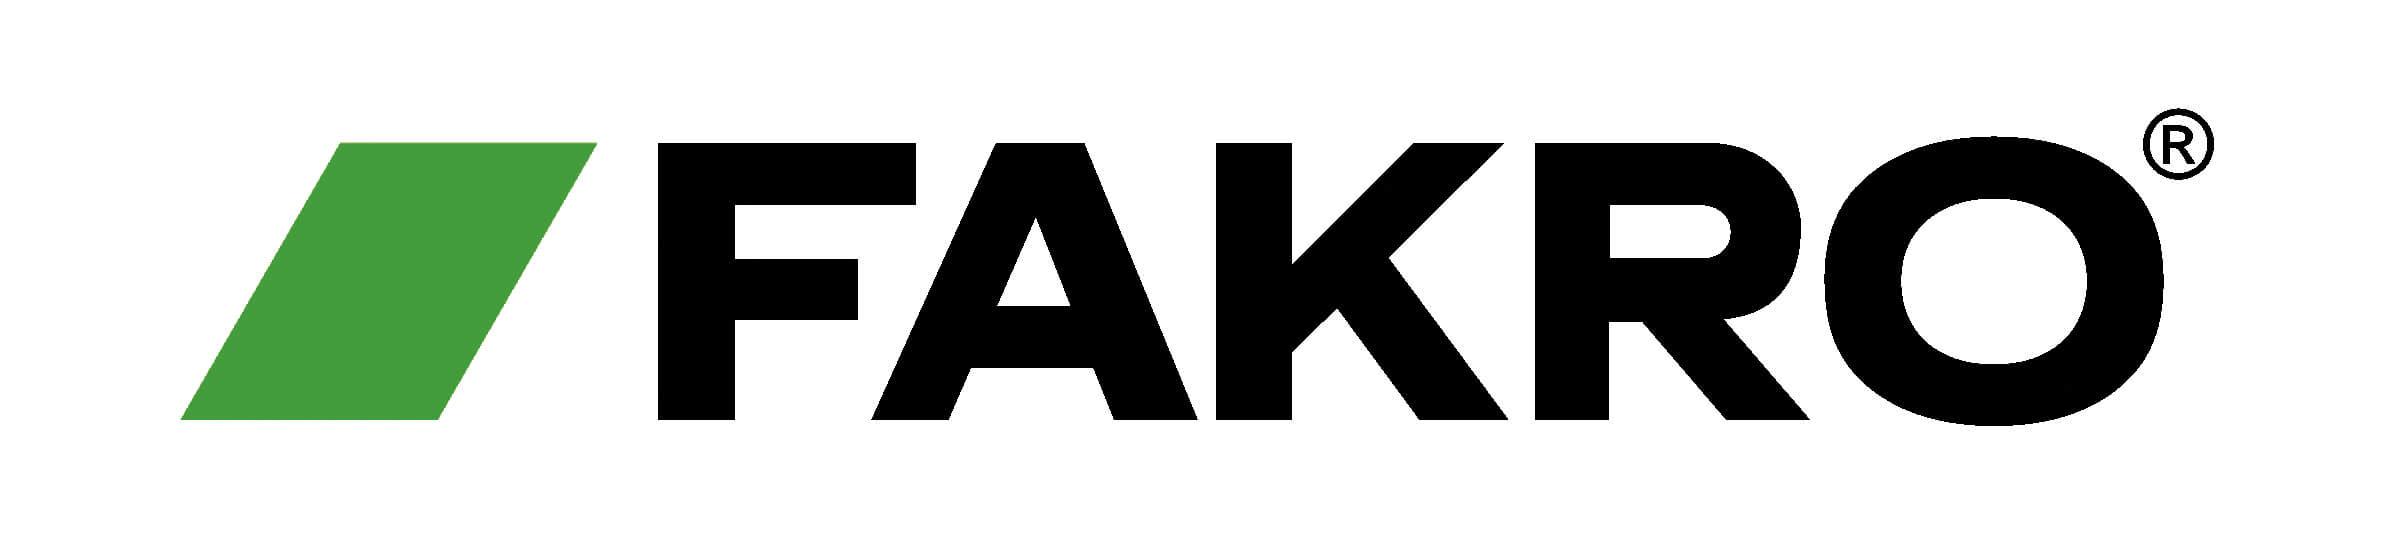 Fakro Logo Wallpaper